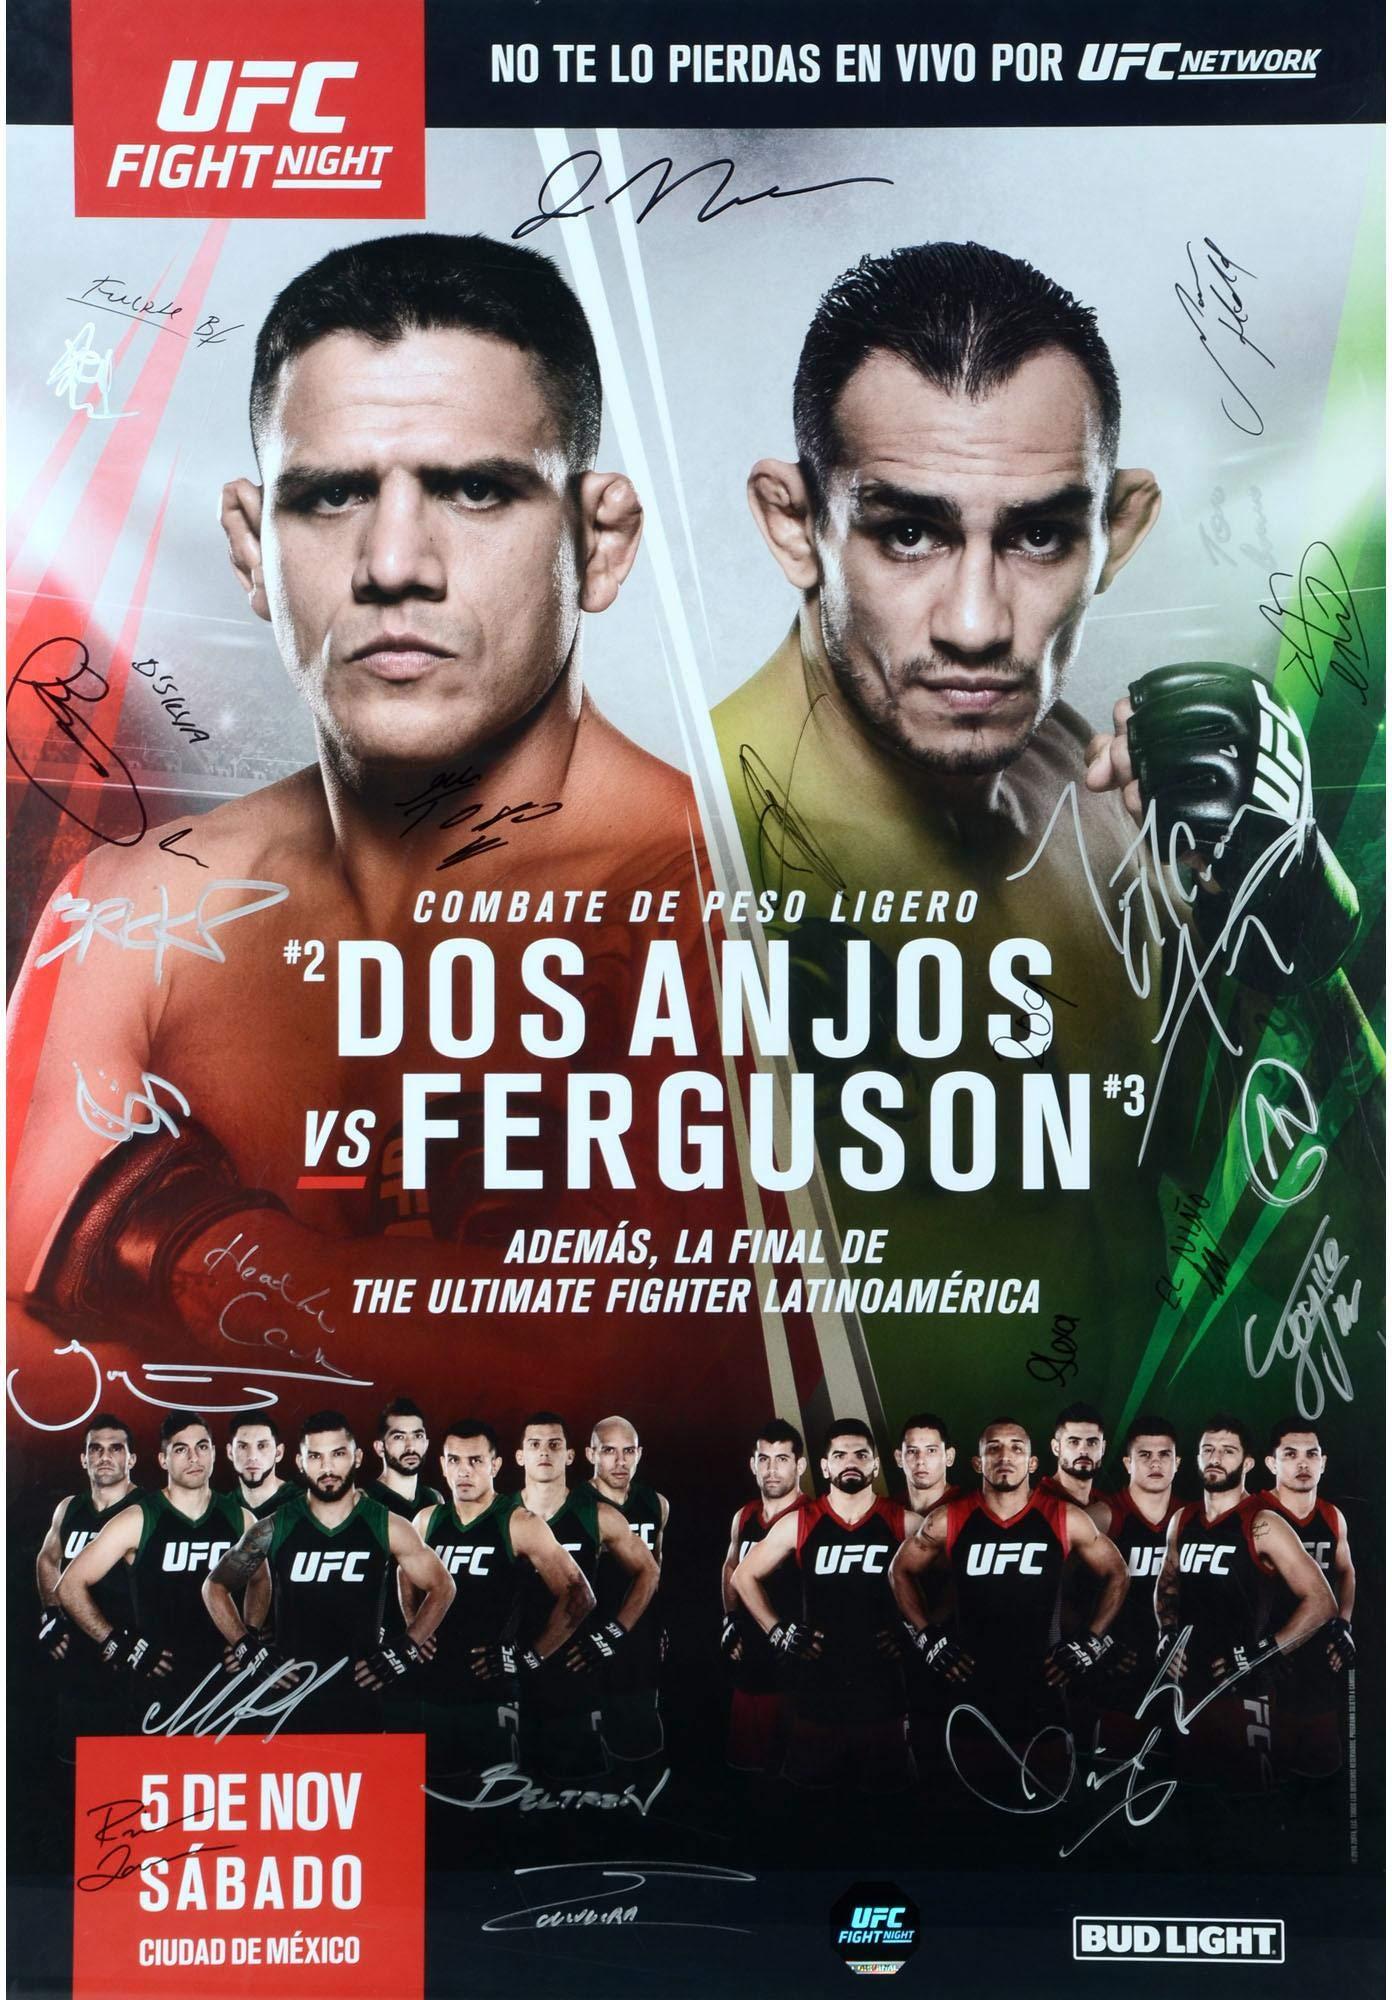 "The Ultimate Fighter Latin America Season 3 Finale Dos Anjos vs. Ferguson Autographed 27"" x 39"" 26 Signature Fight Poster Fanatics Authentic Certified"